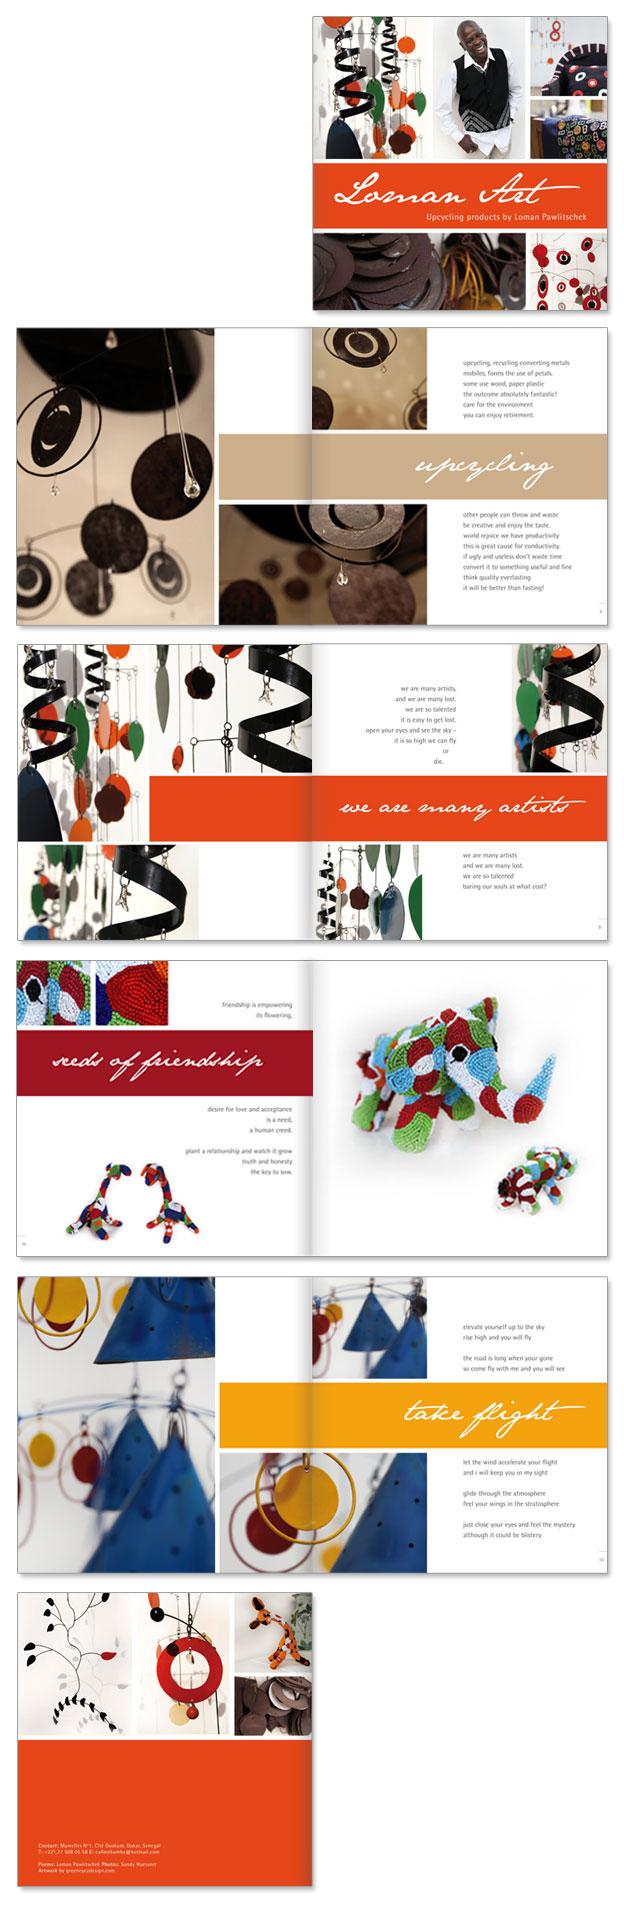 Loman Catalogue